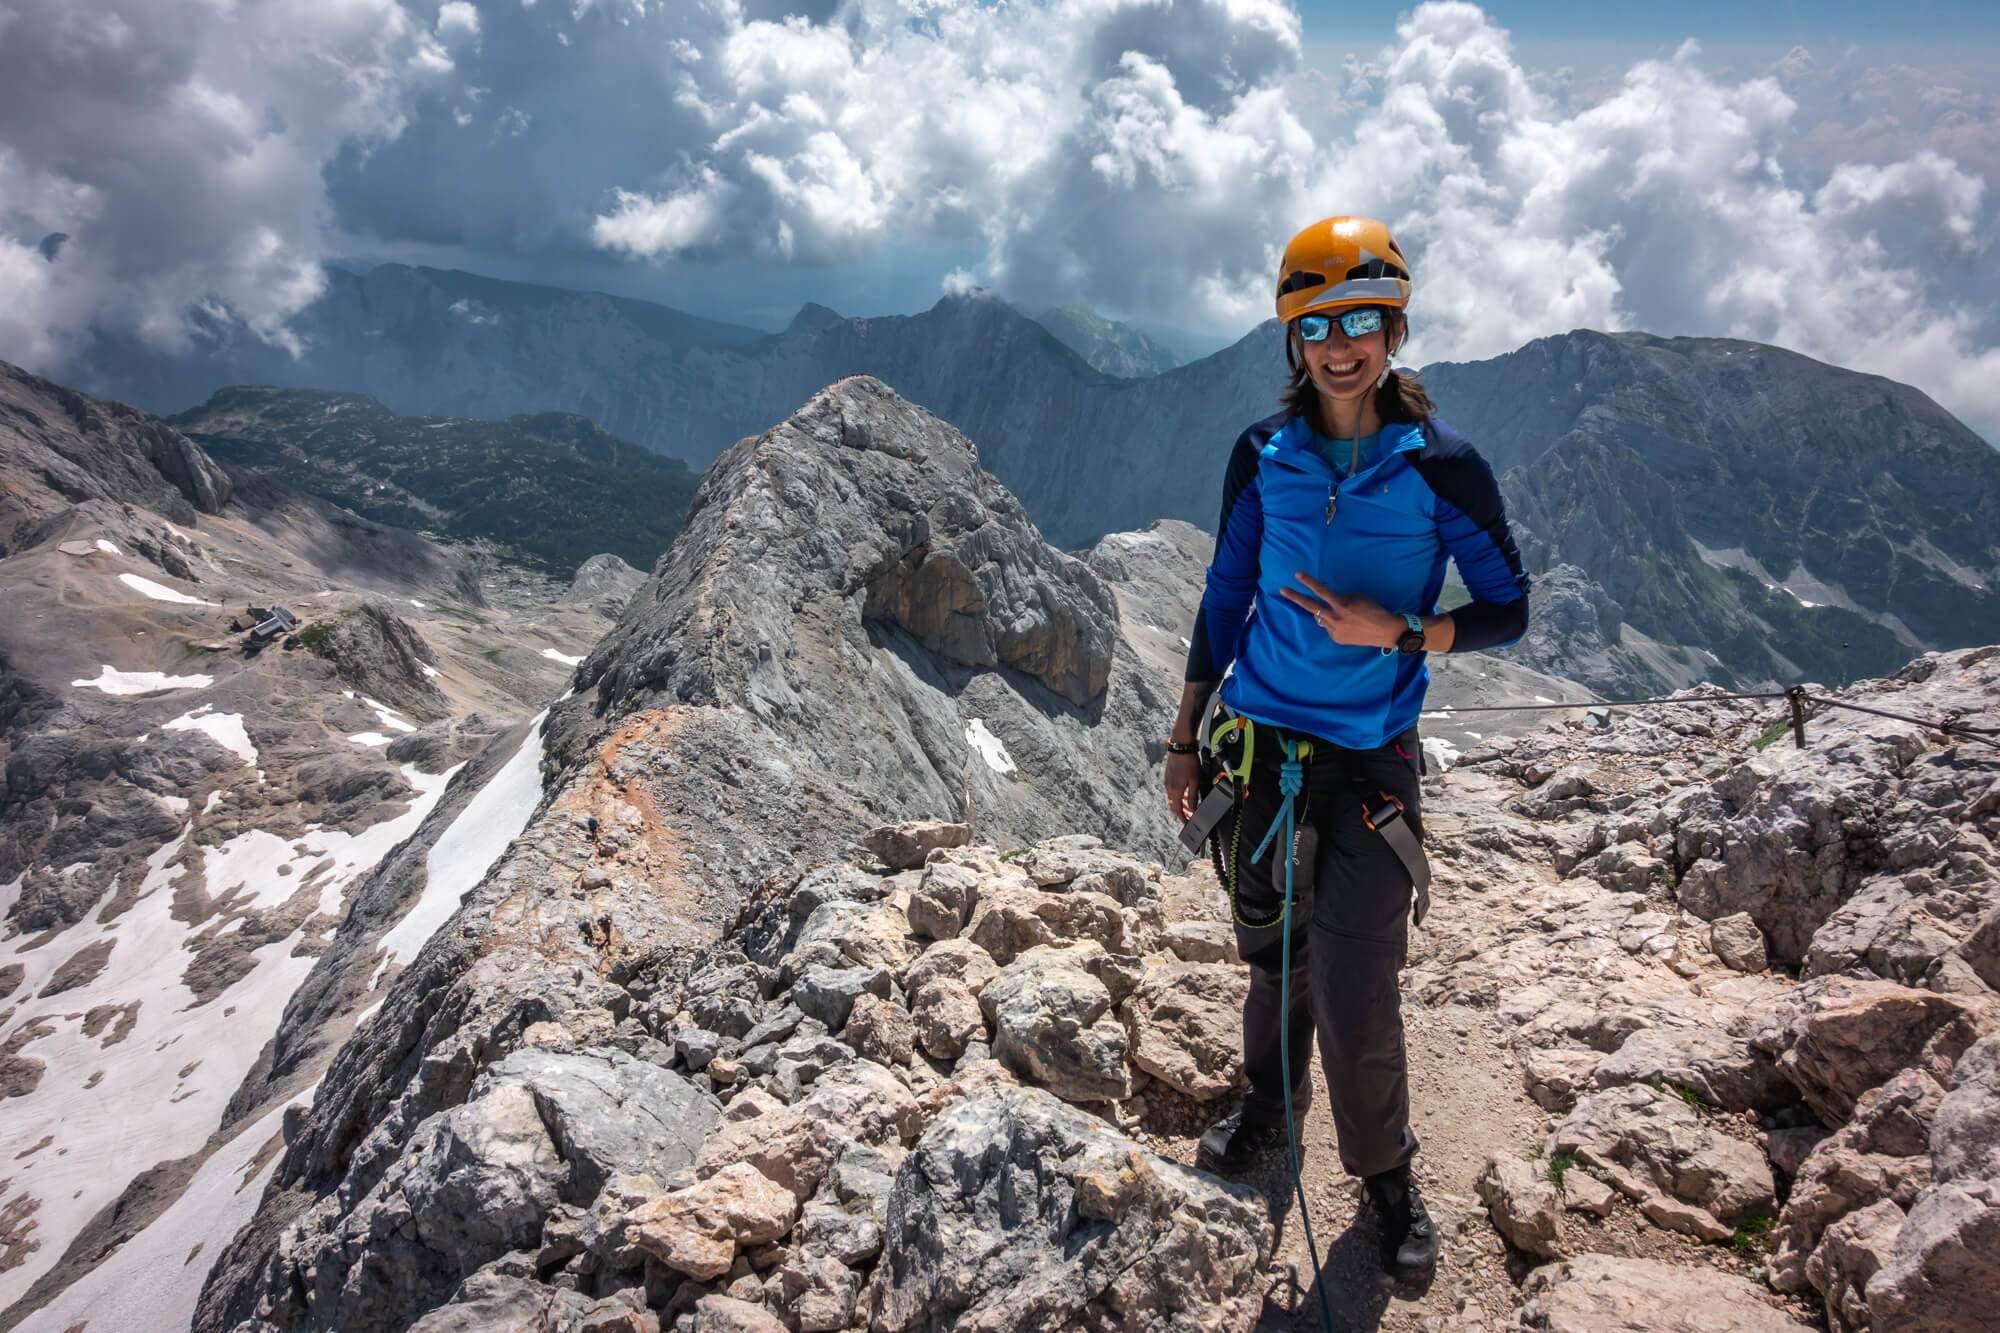 Happy Female Climber Ascending Triglav Peak, Small Triglav on the Background